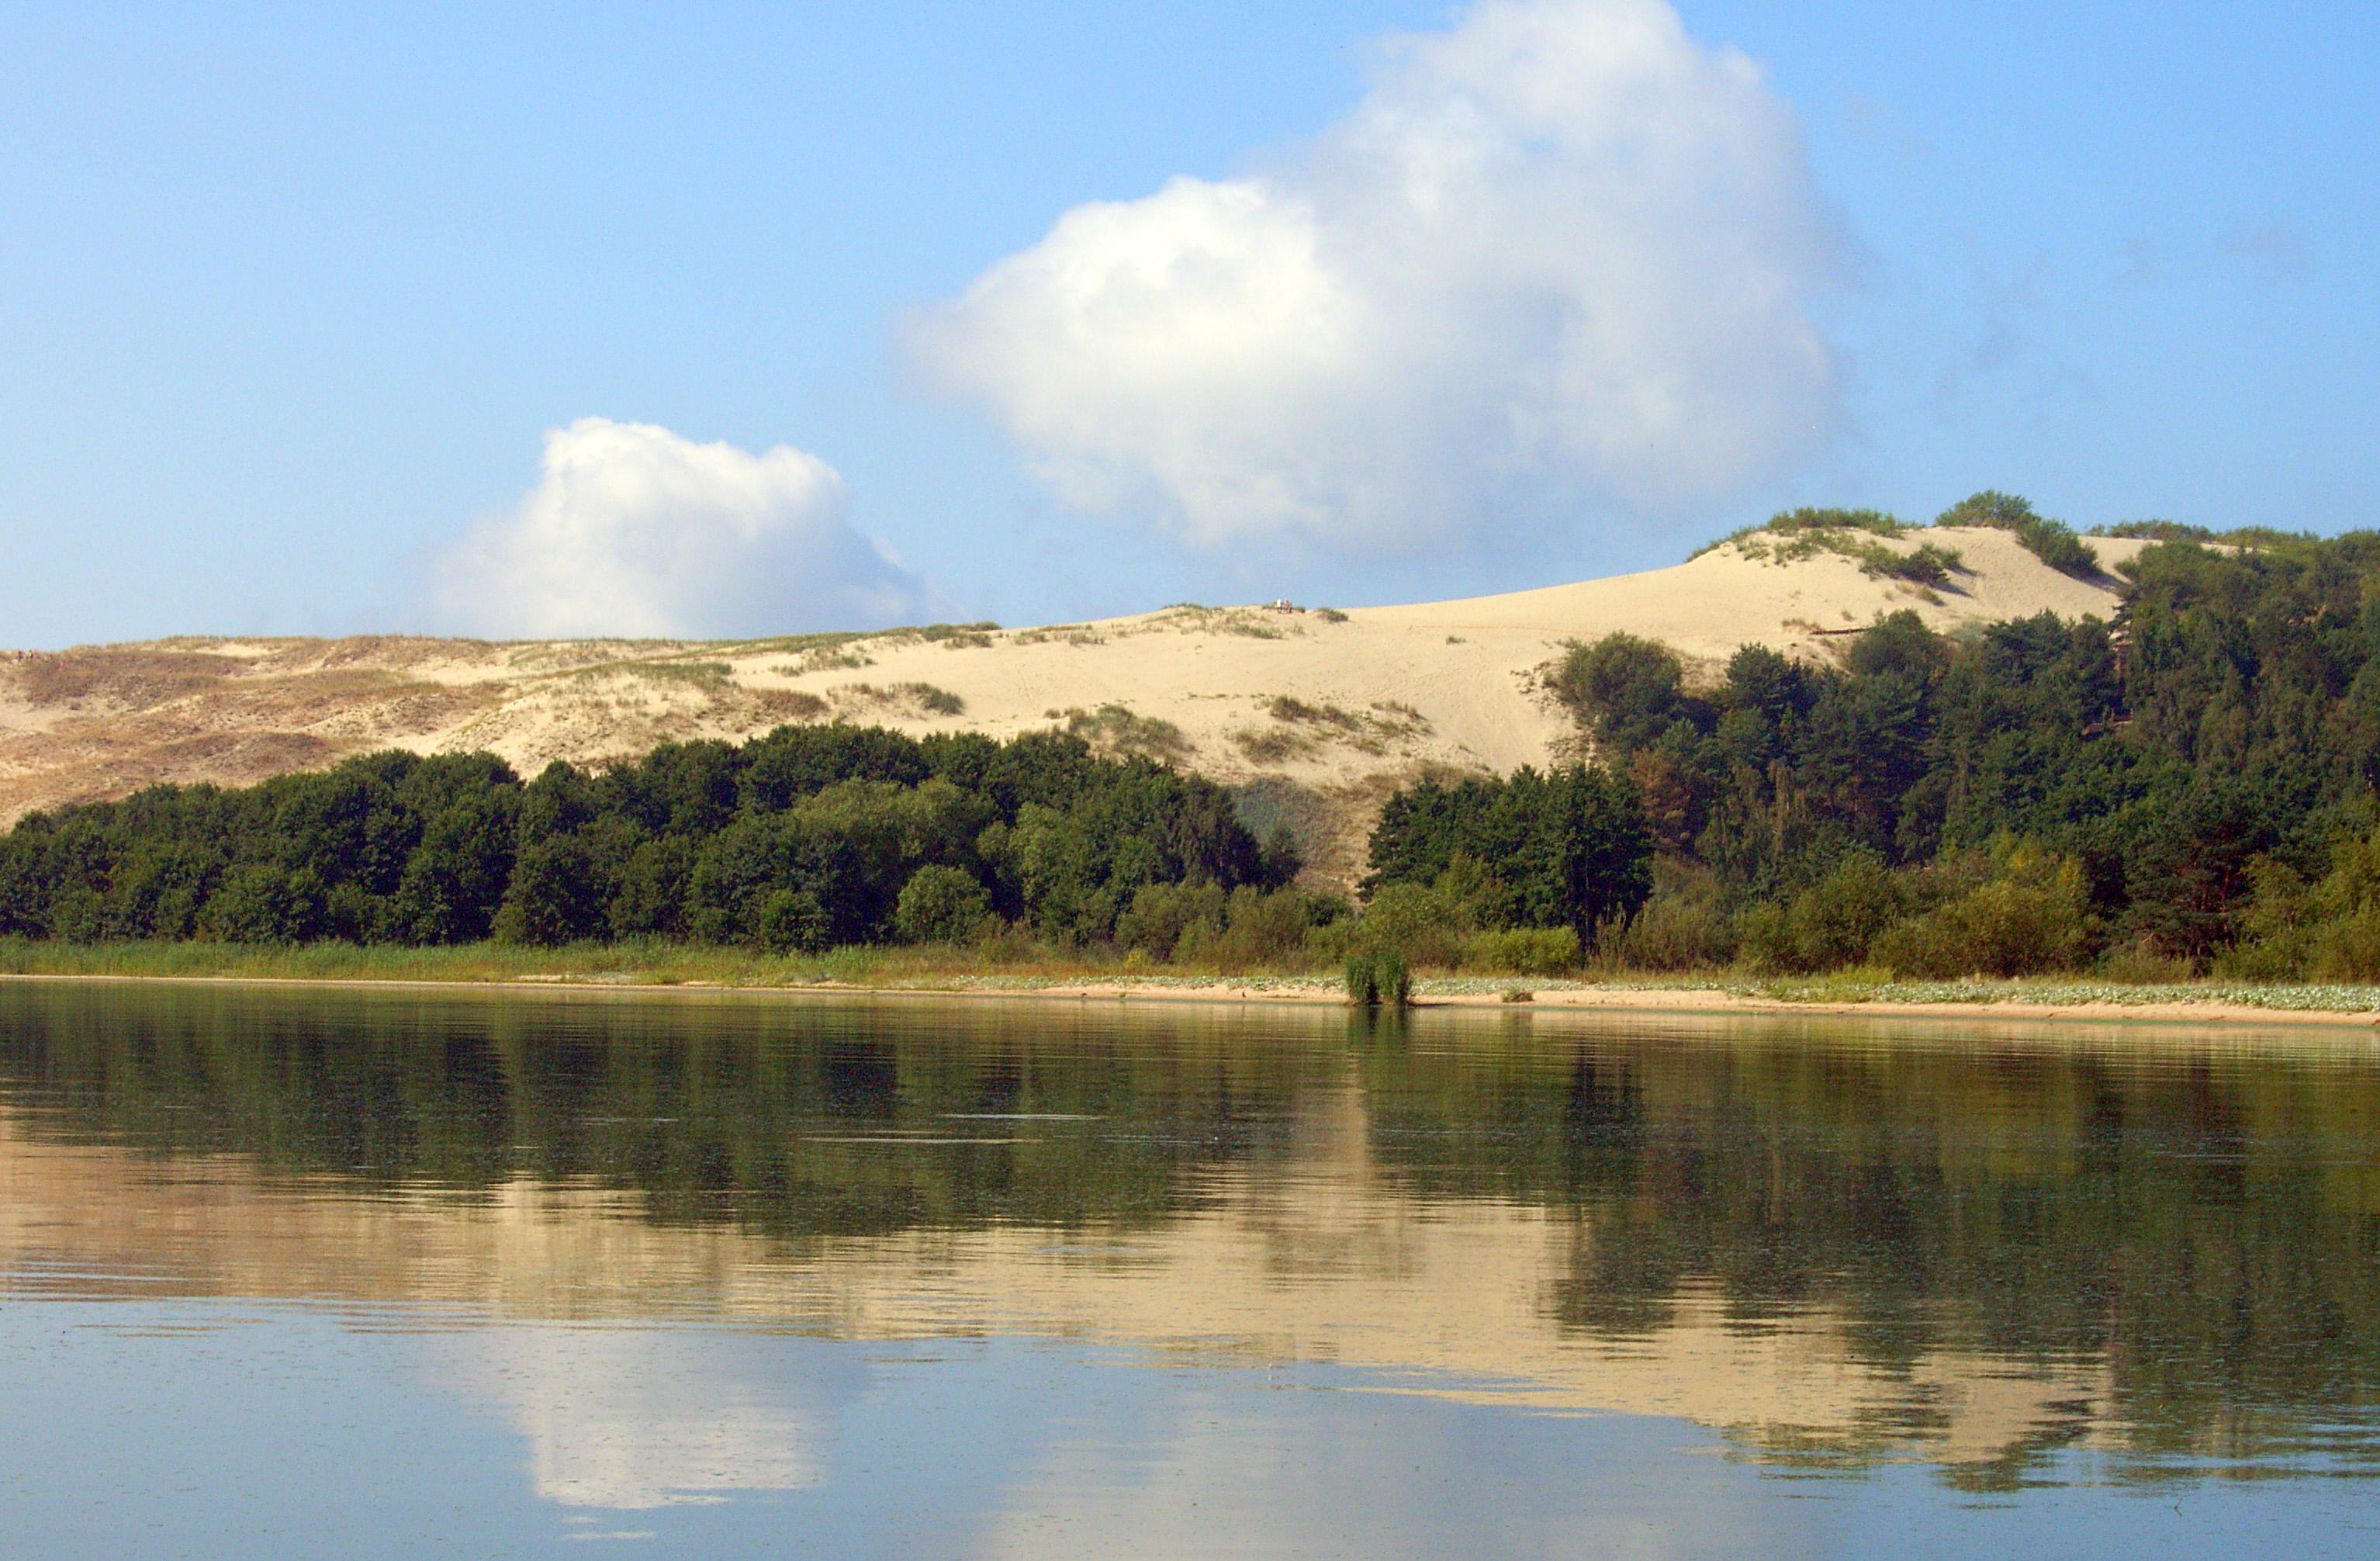 download australasian nature photography anzang tenth